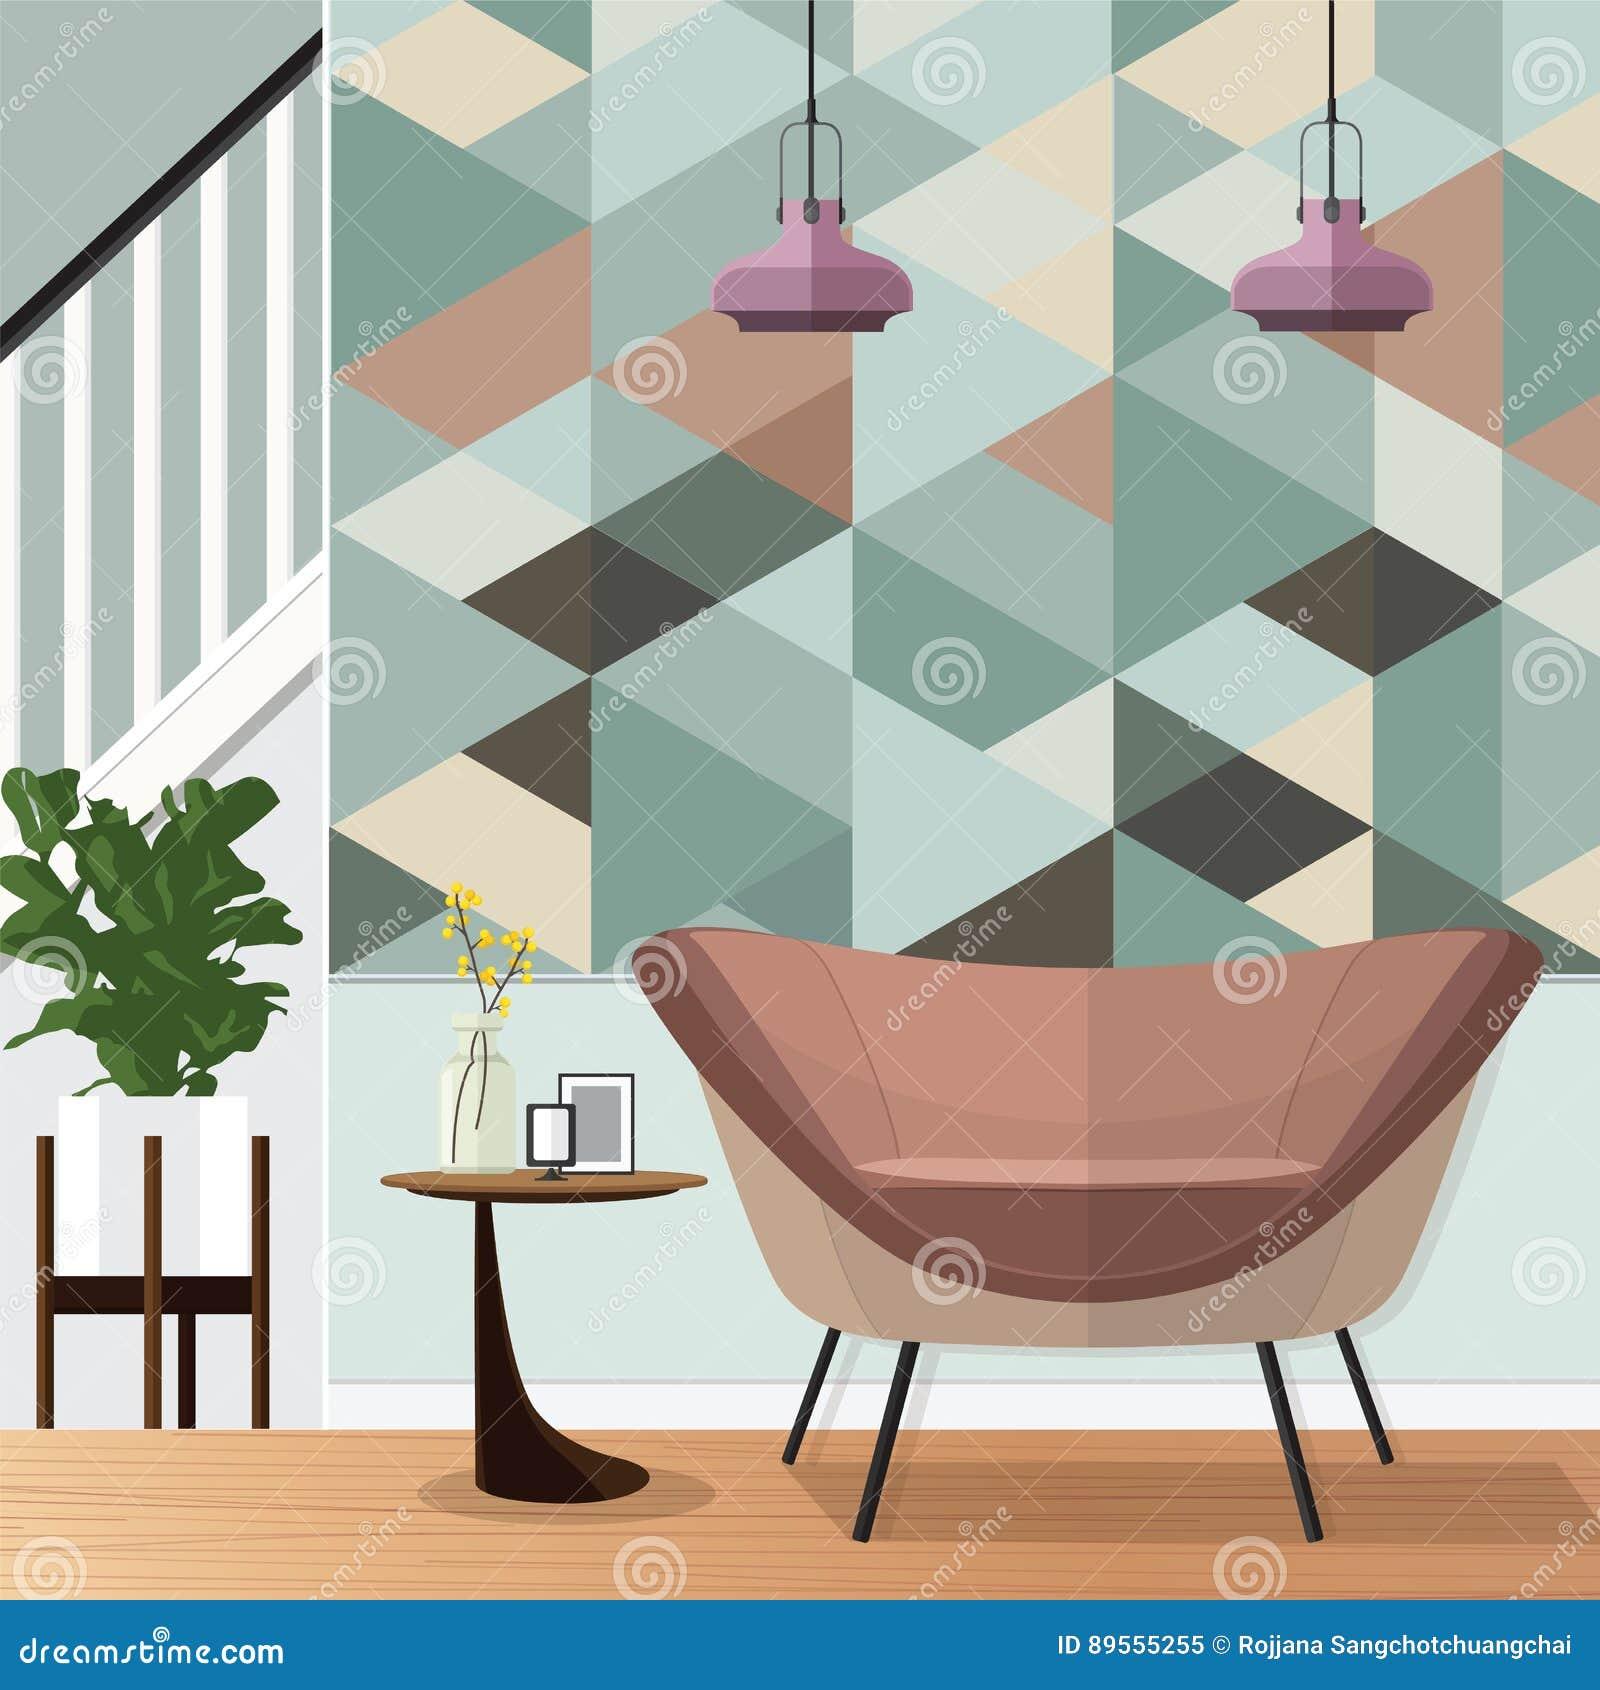 Rc Furniture Interior Design Stock Dealer ~ Ceiling cartoons illustrations vector stock images